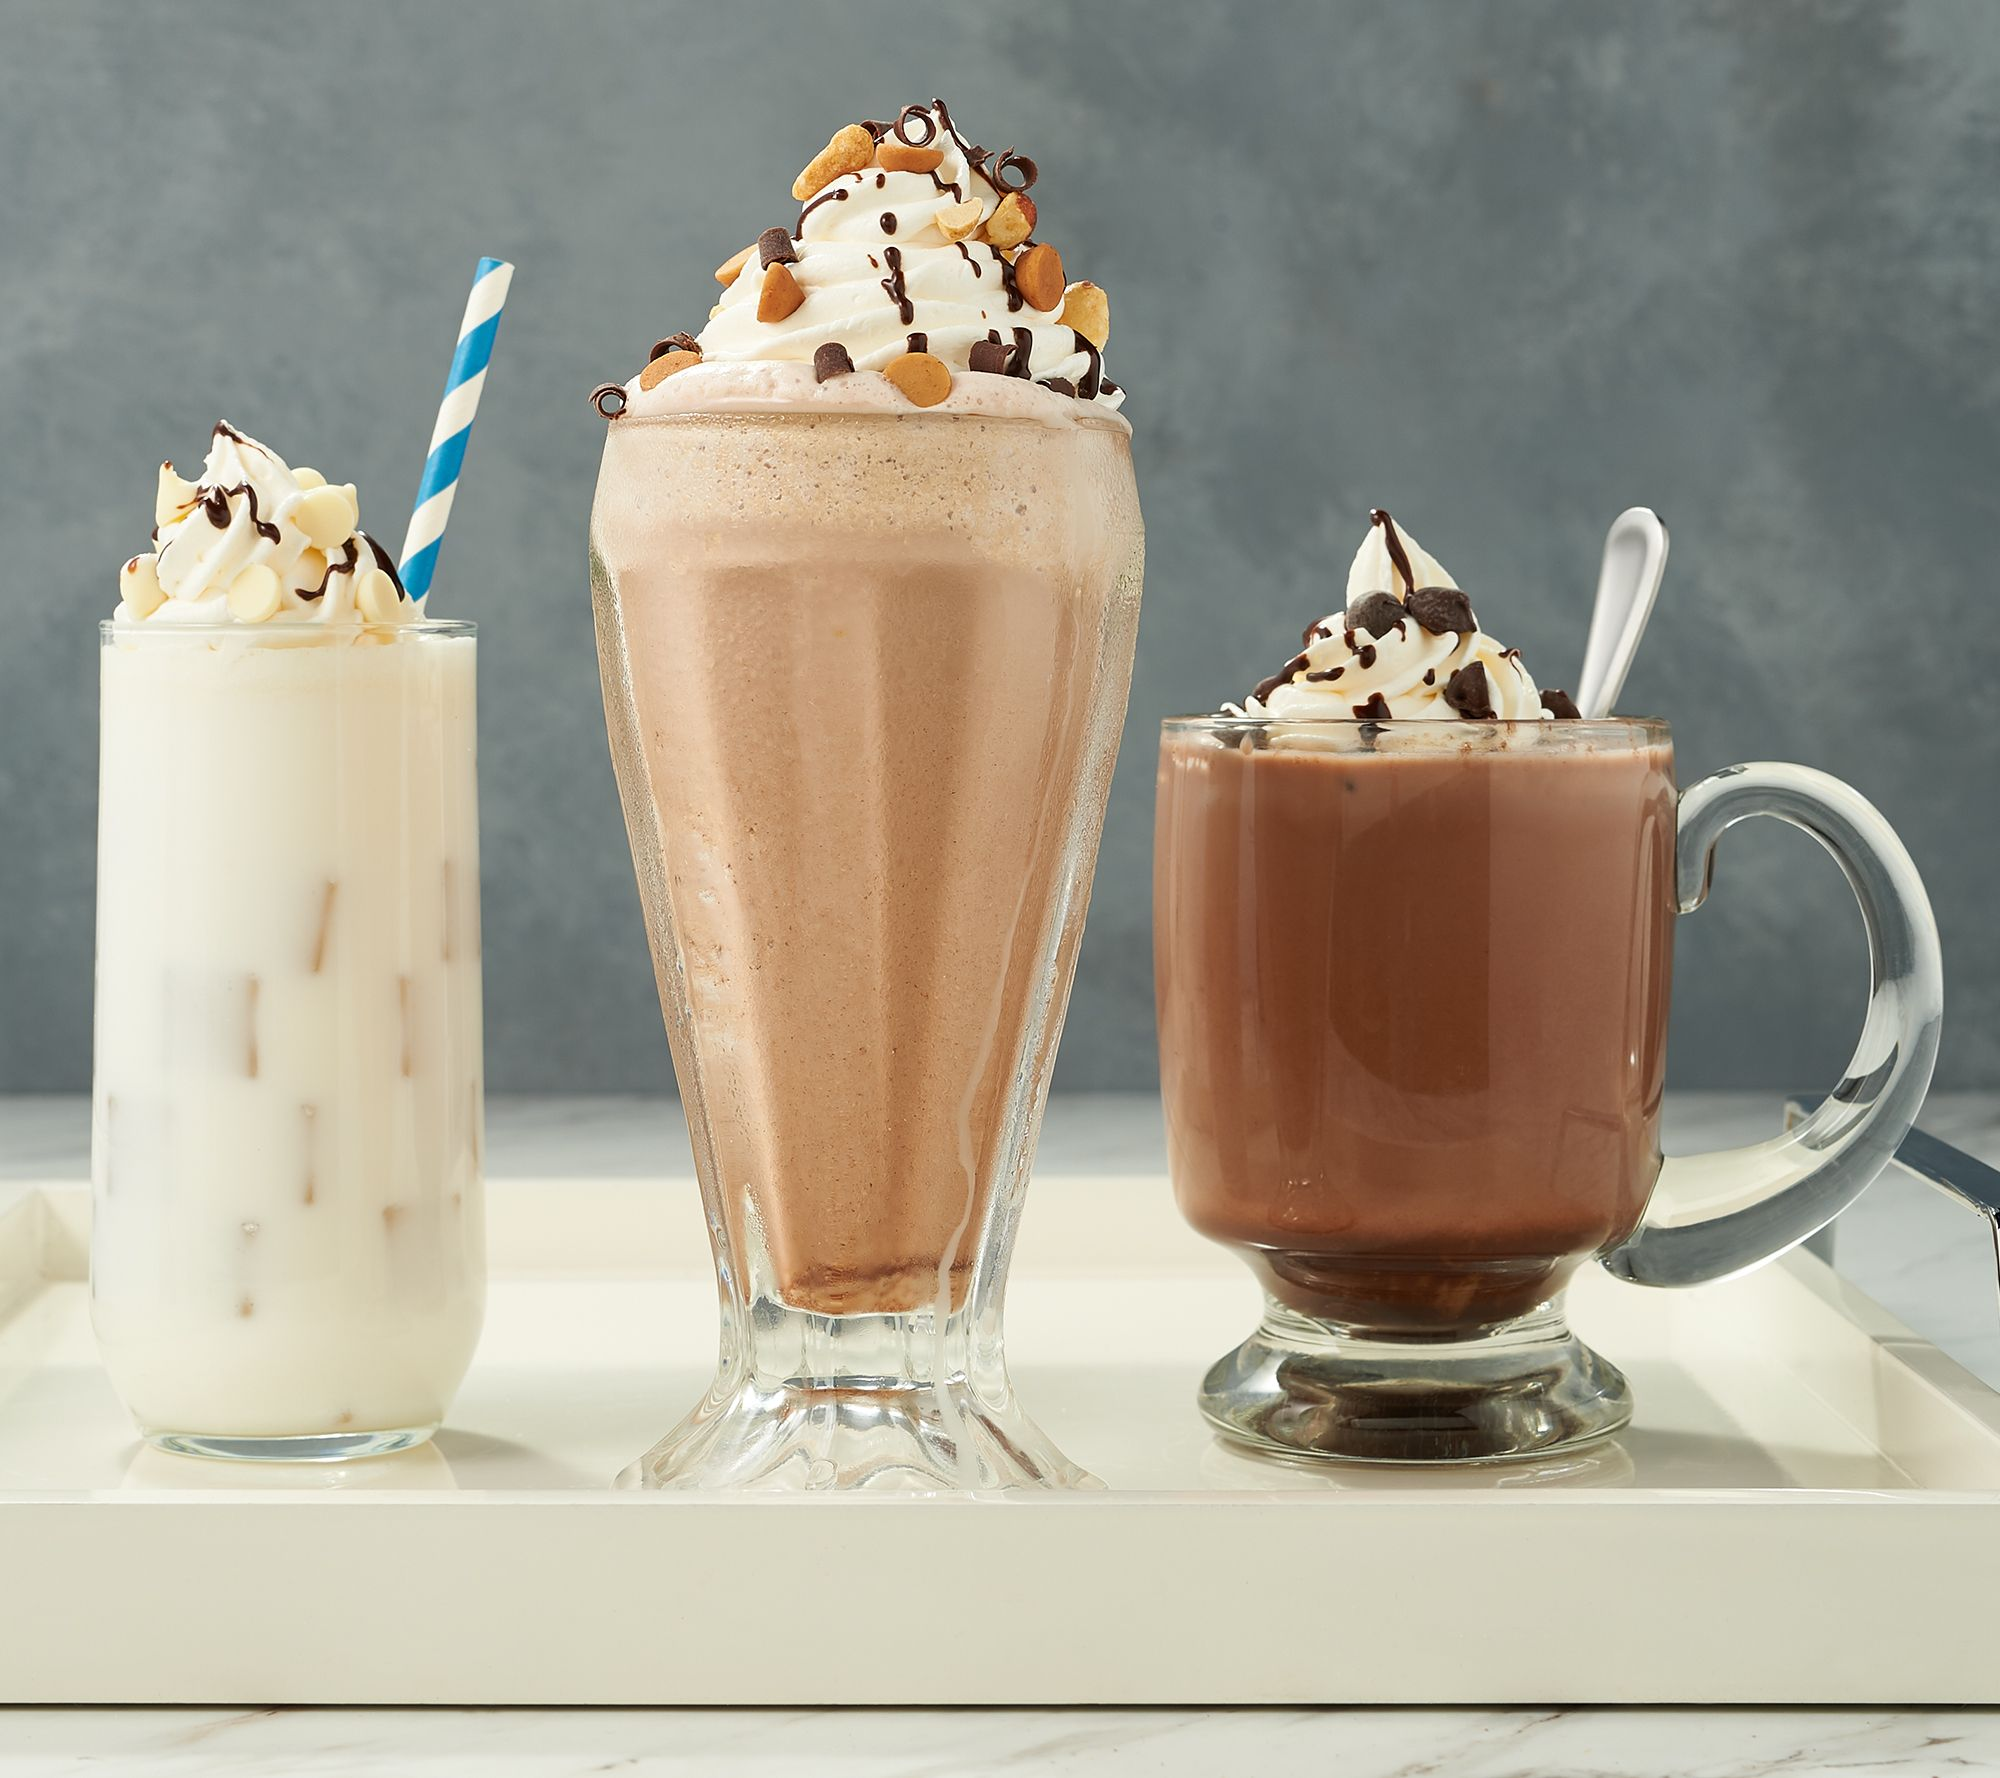 Frozen Bean 3 21 Oz Cans Frozen Or Hot Chocolate Drink Blends